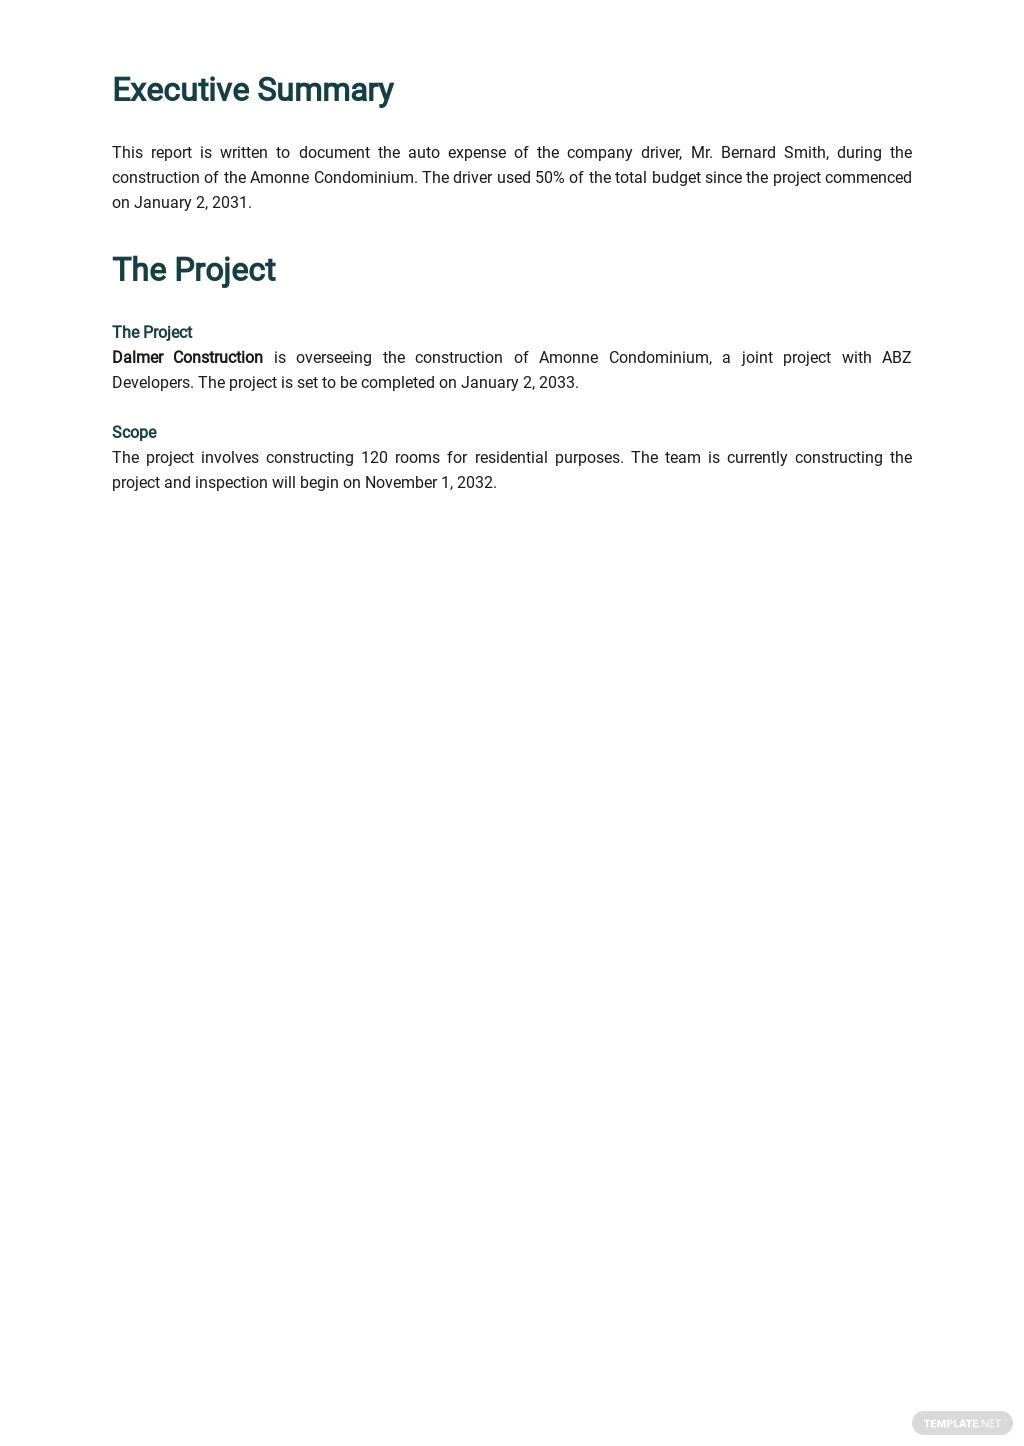 Construction Auto Expense Report Template 1.jpe